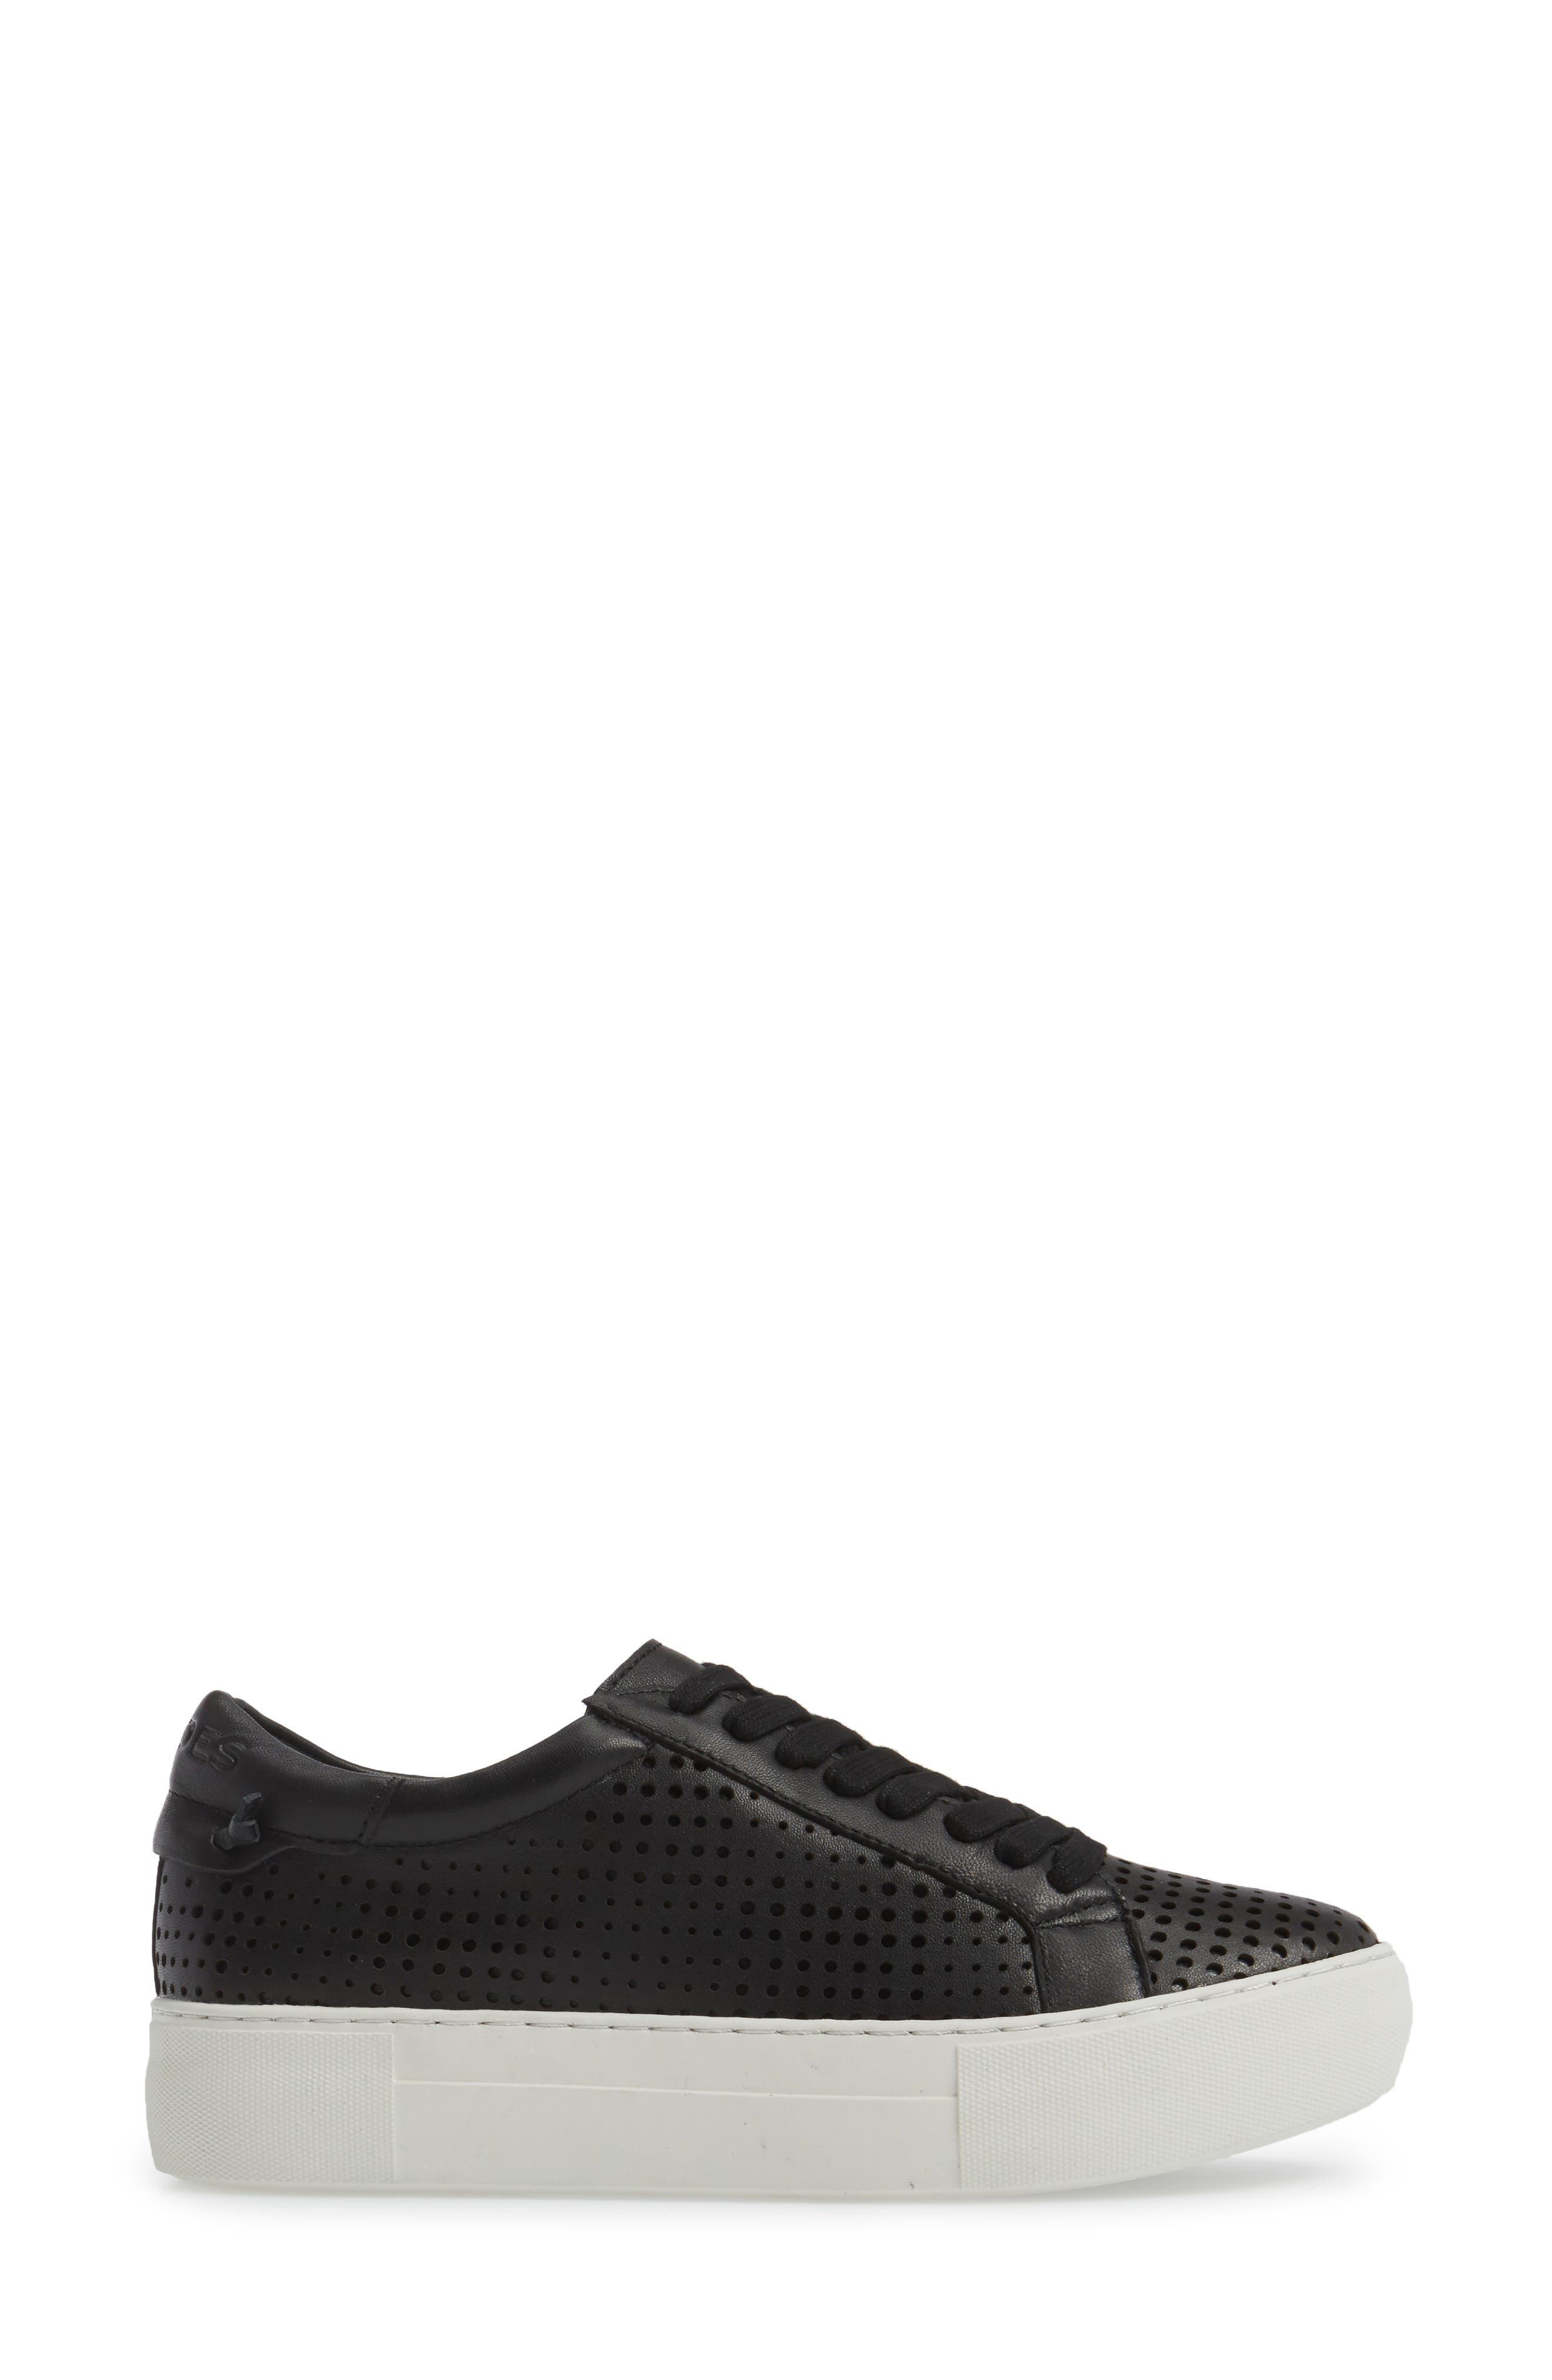 Audrina Platform Sneaker,                             Alternate thumbnail 3, color,                             Black Leather